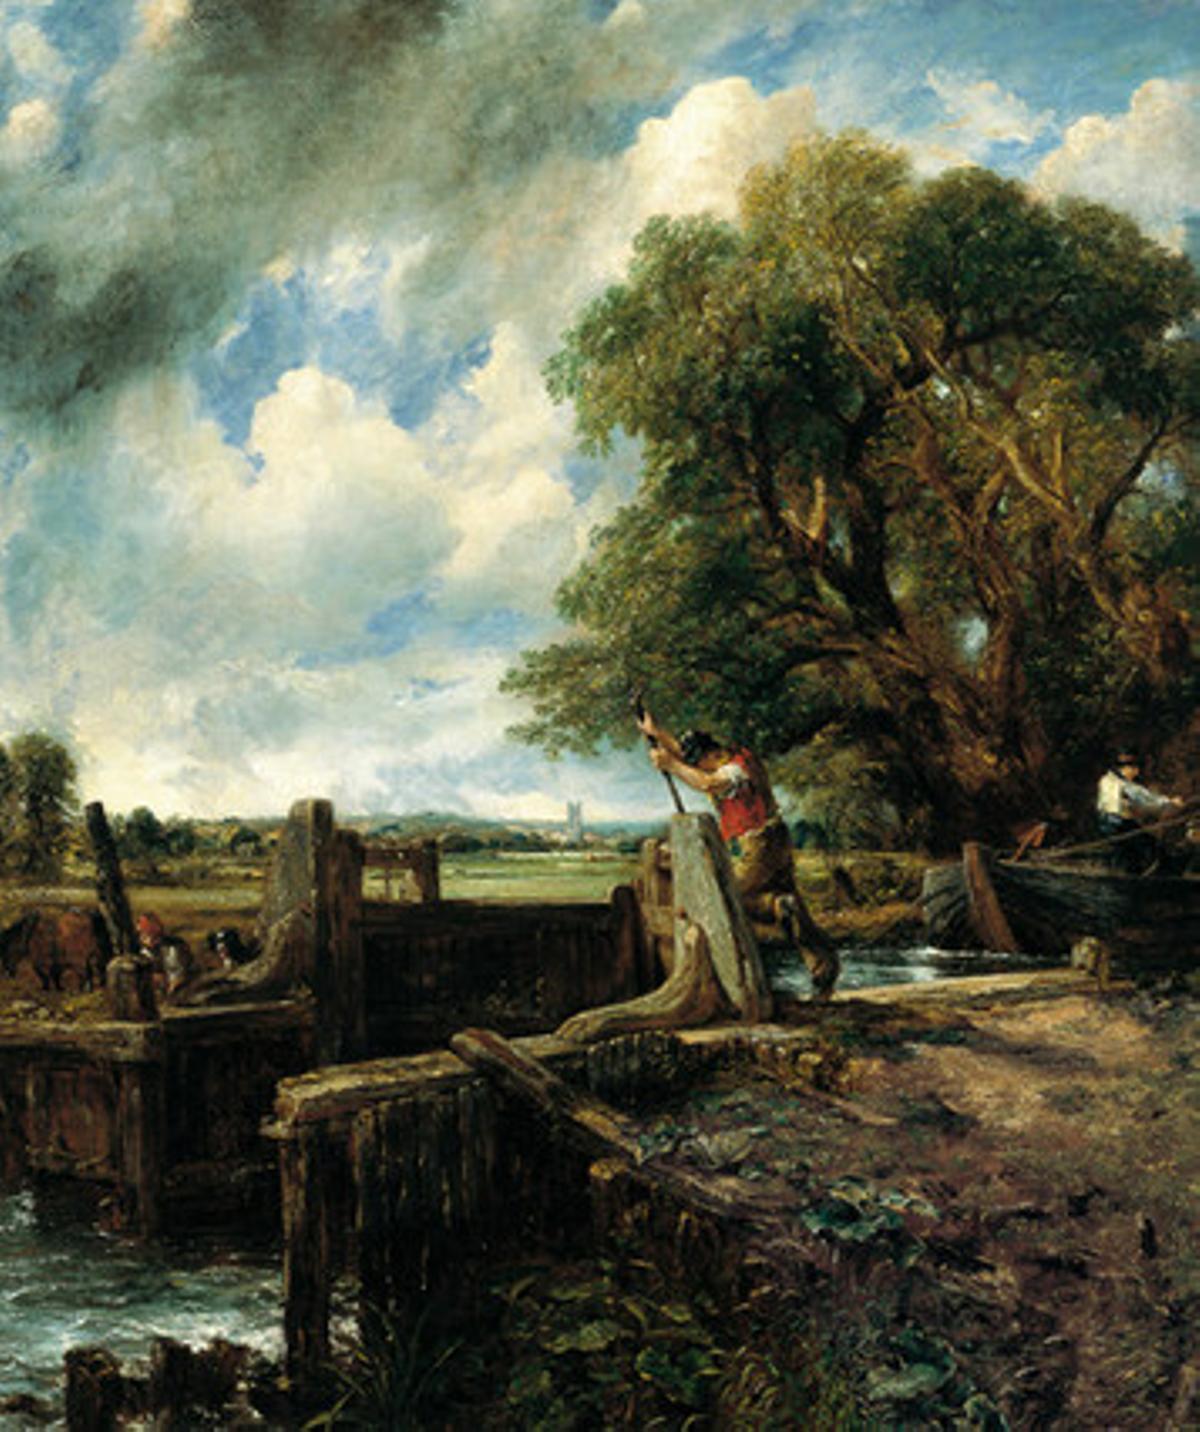 'La esclusa', de John Constable.